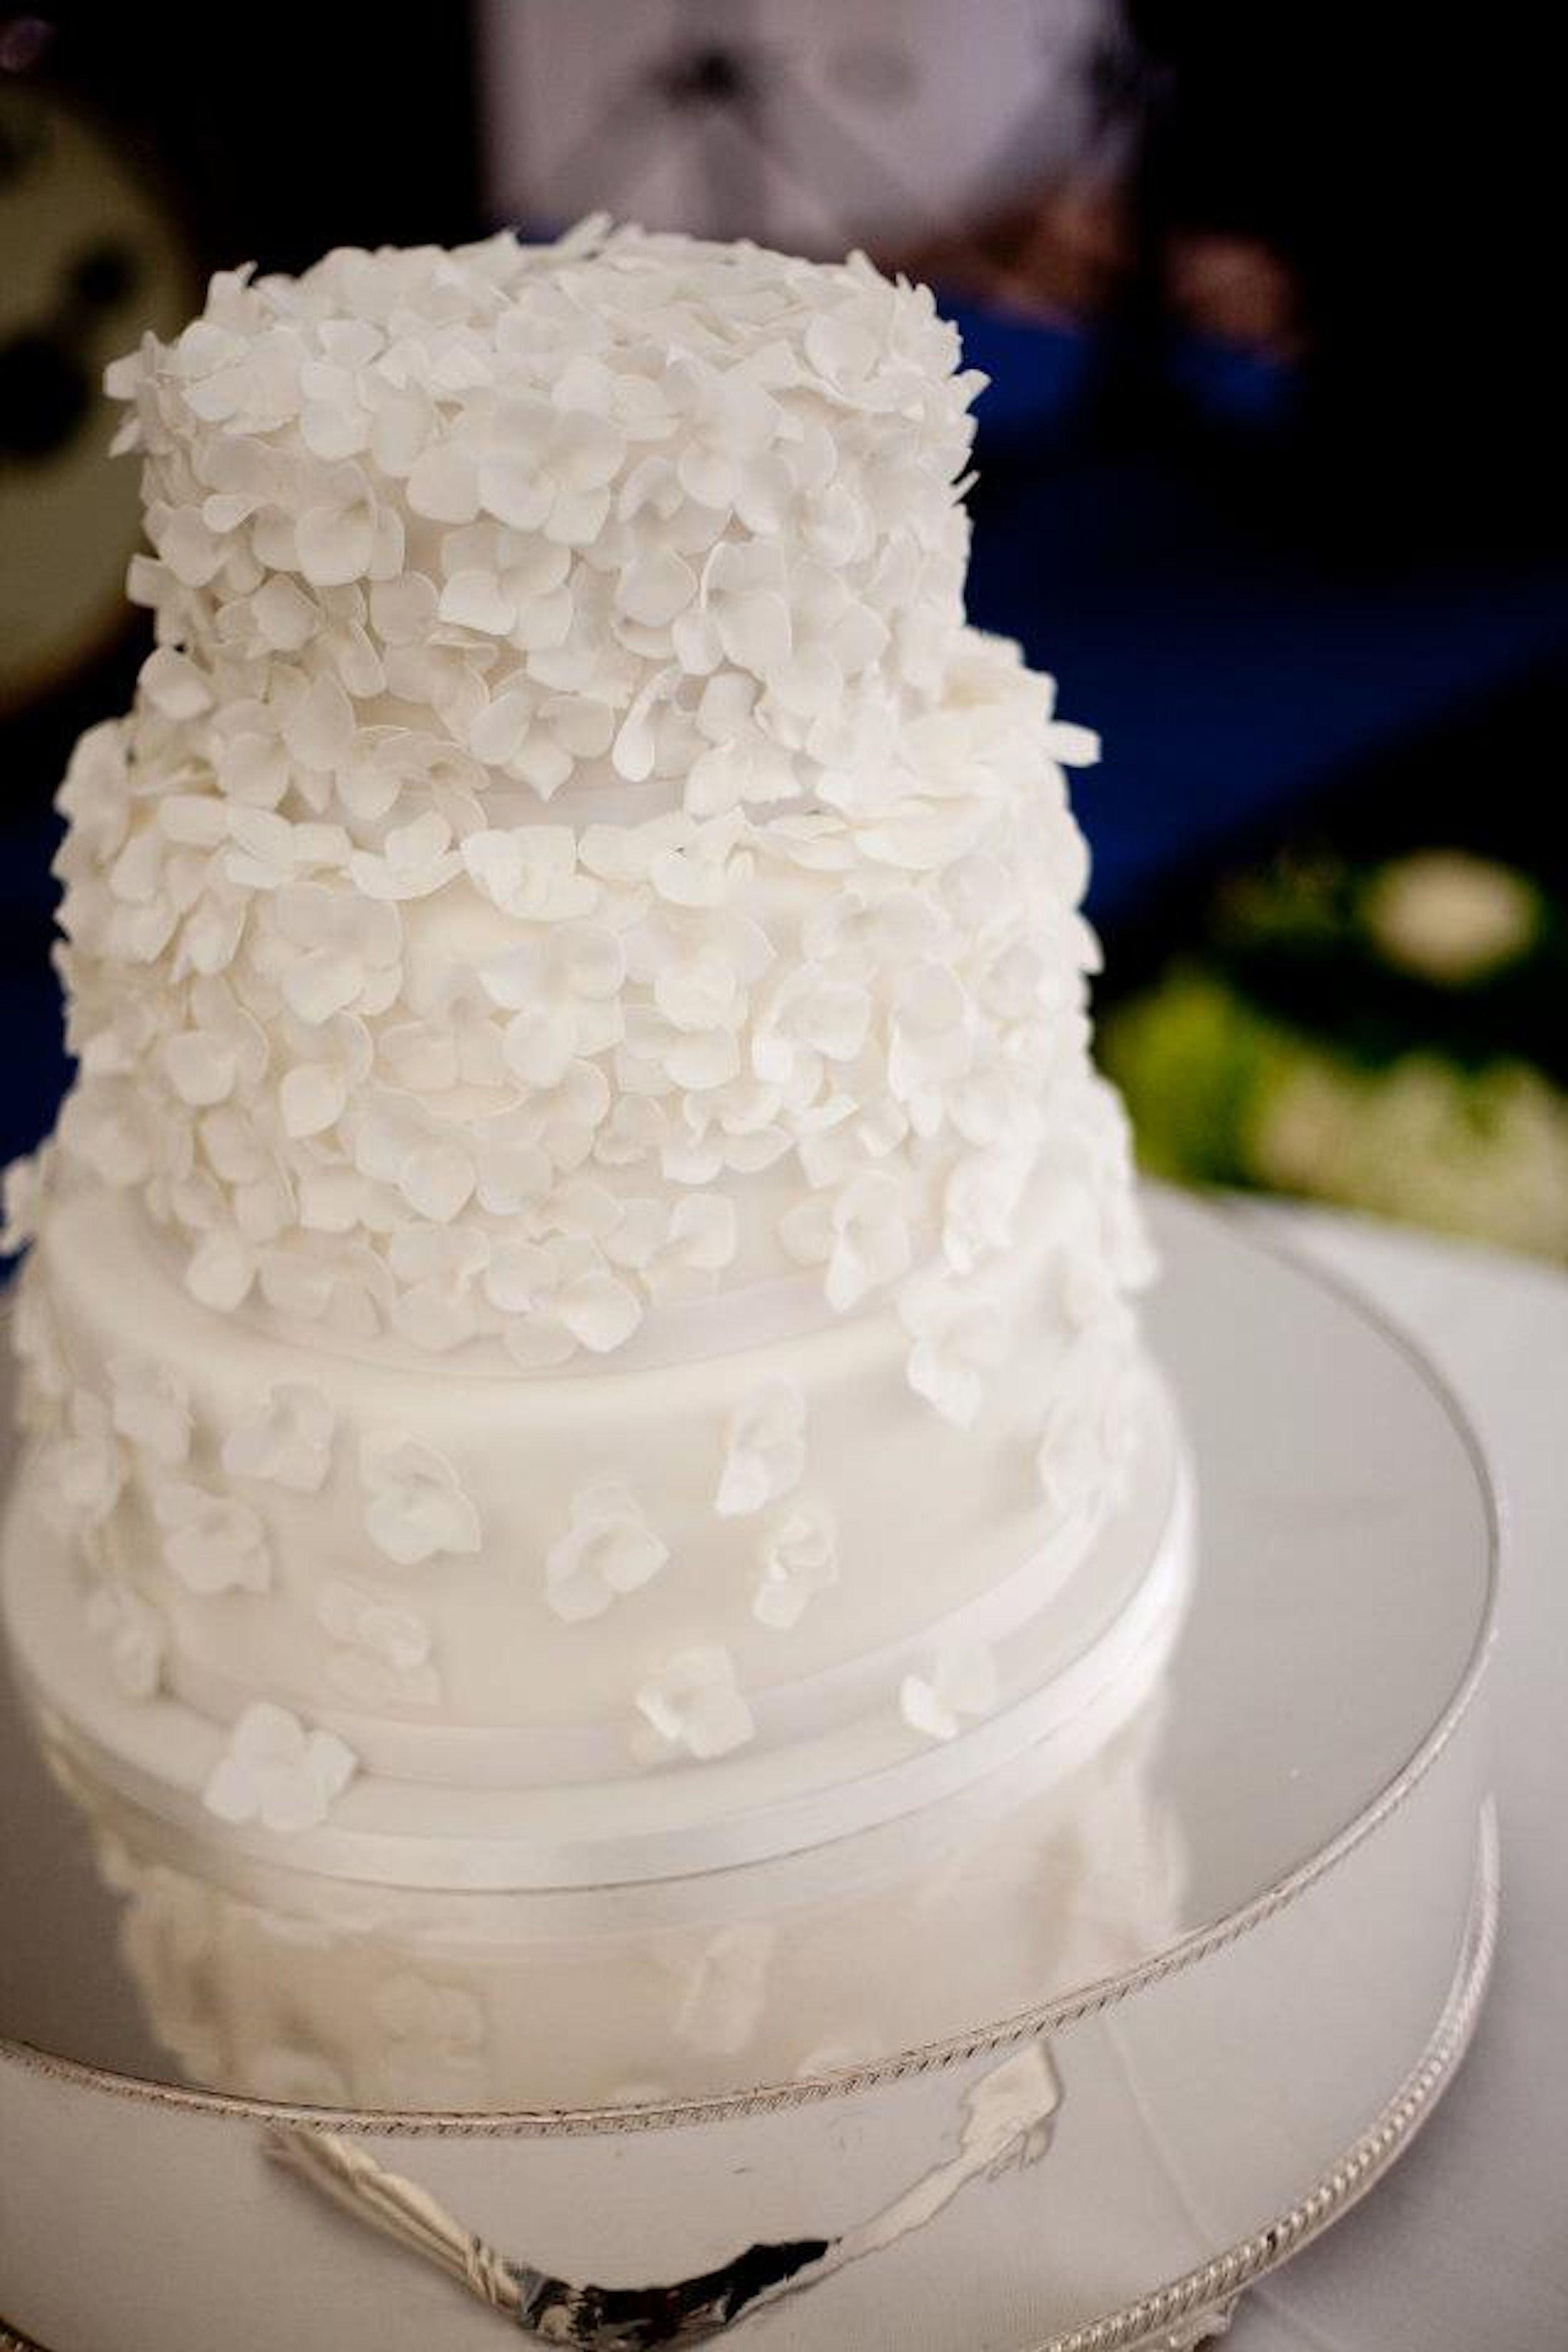 Cake Wedding White Hydrangea Wedding Cake Icing Petal Contemporary Hydrang Wedding Cake Frosting Wedding Cake Frosting Recipe Wedding Cake Icing Recipe